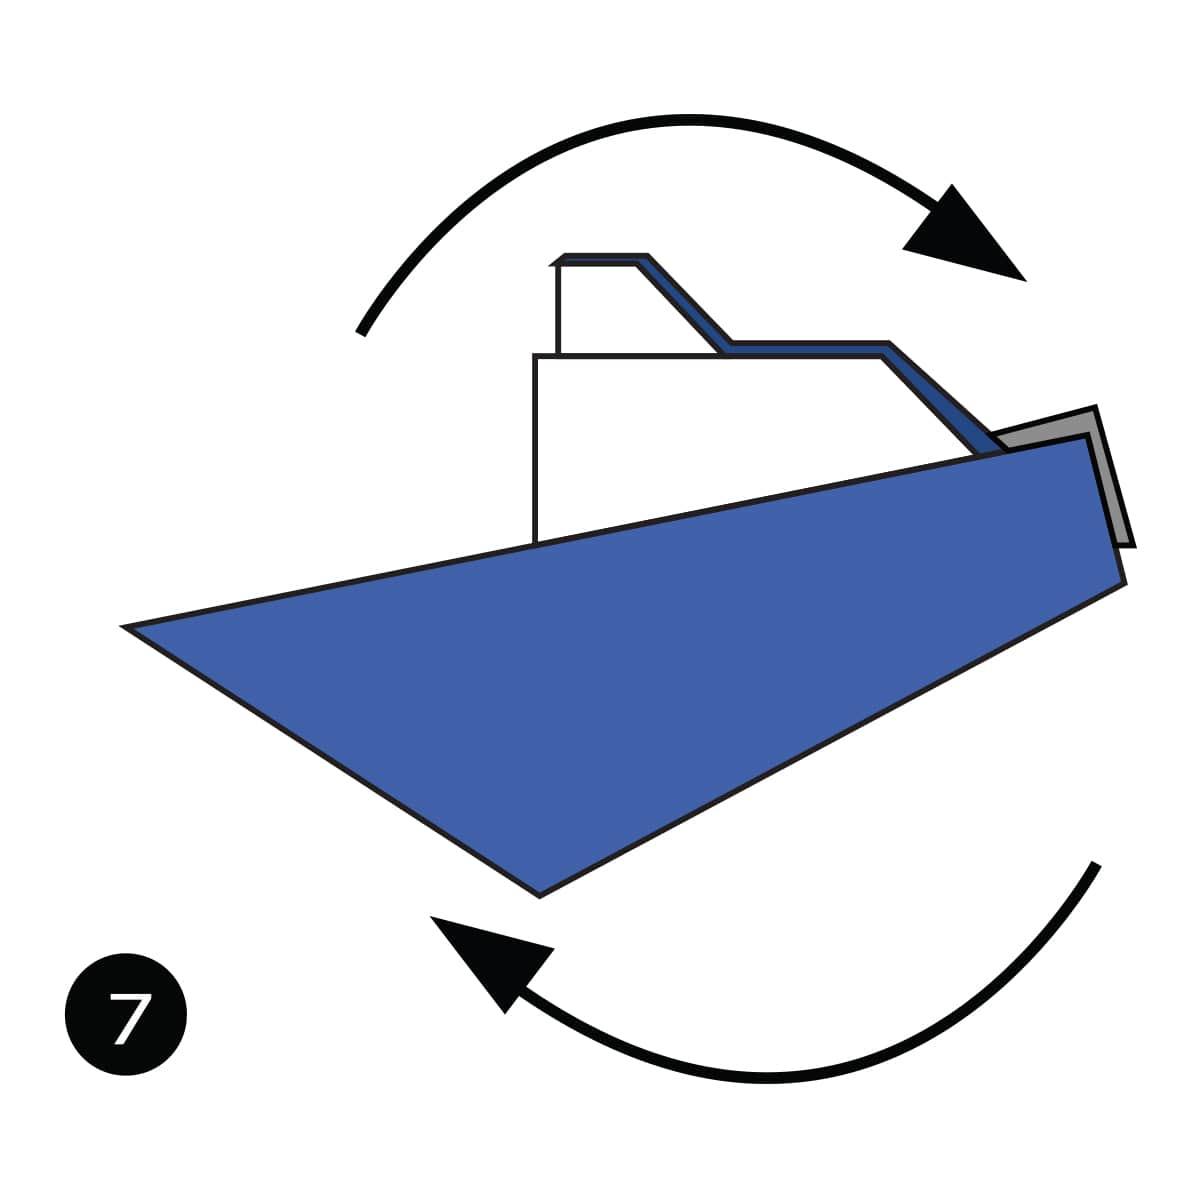 Boat Step 7